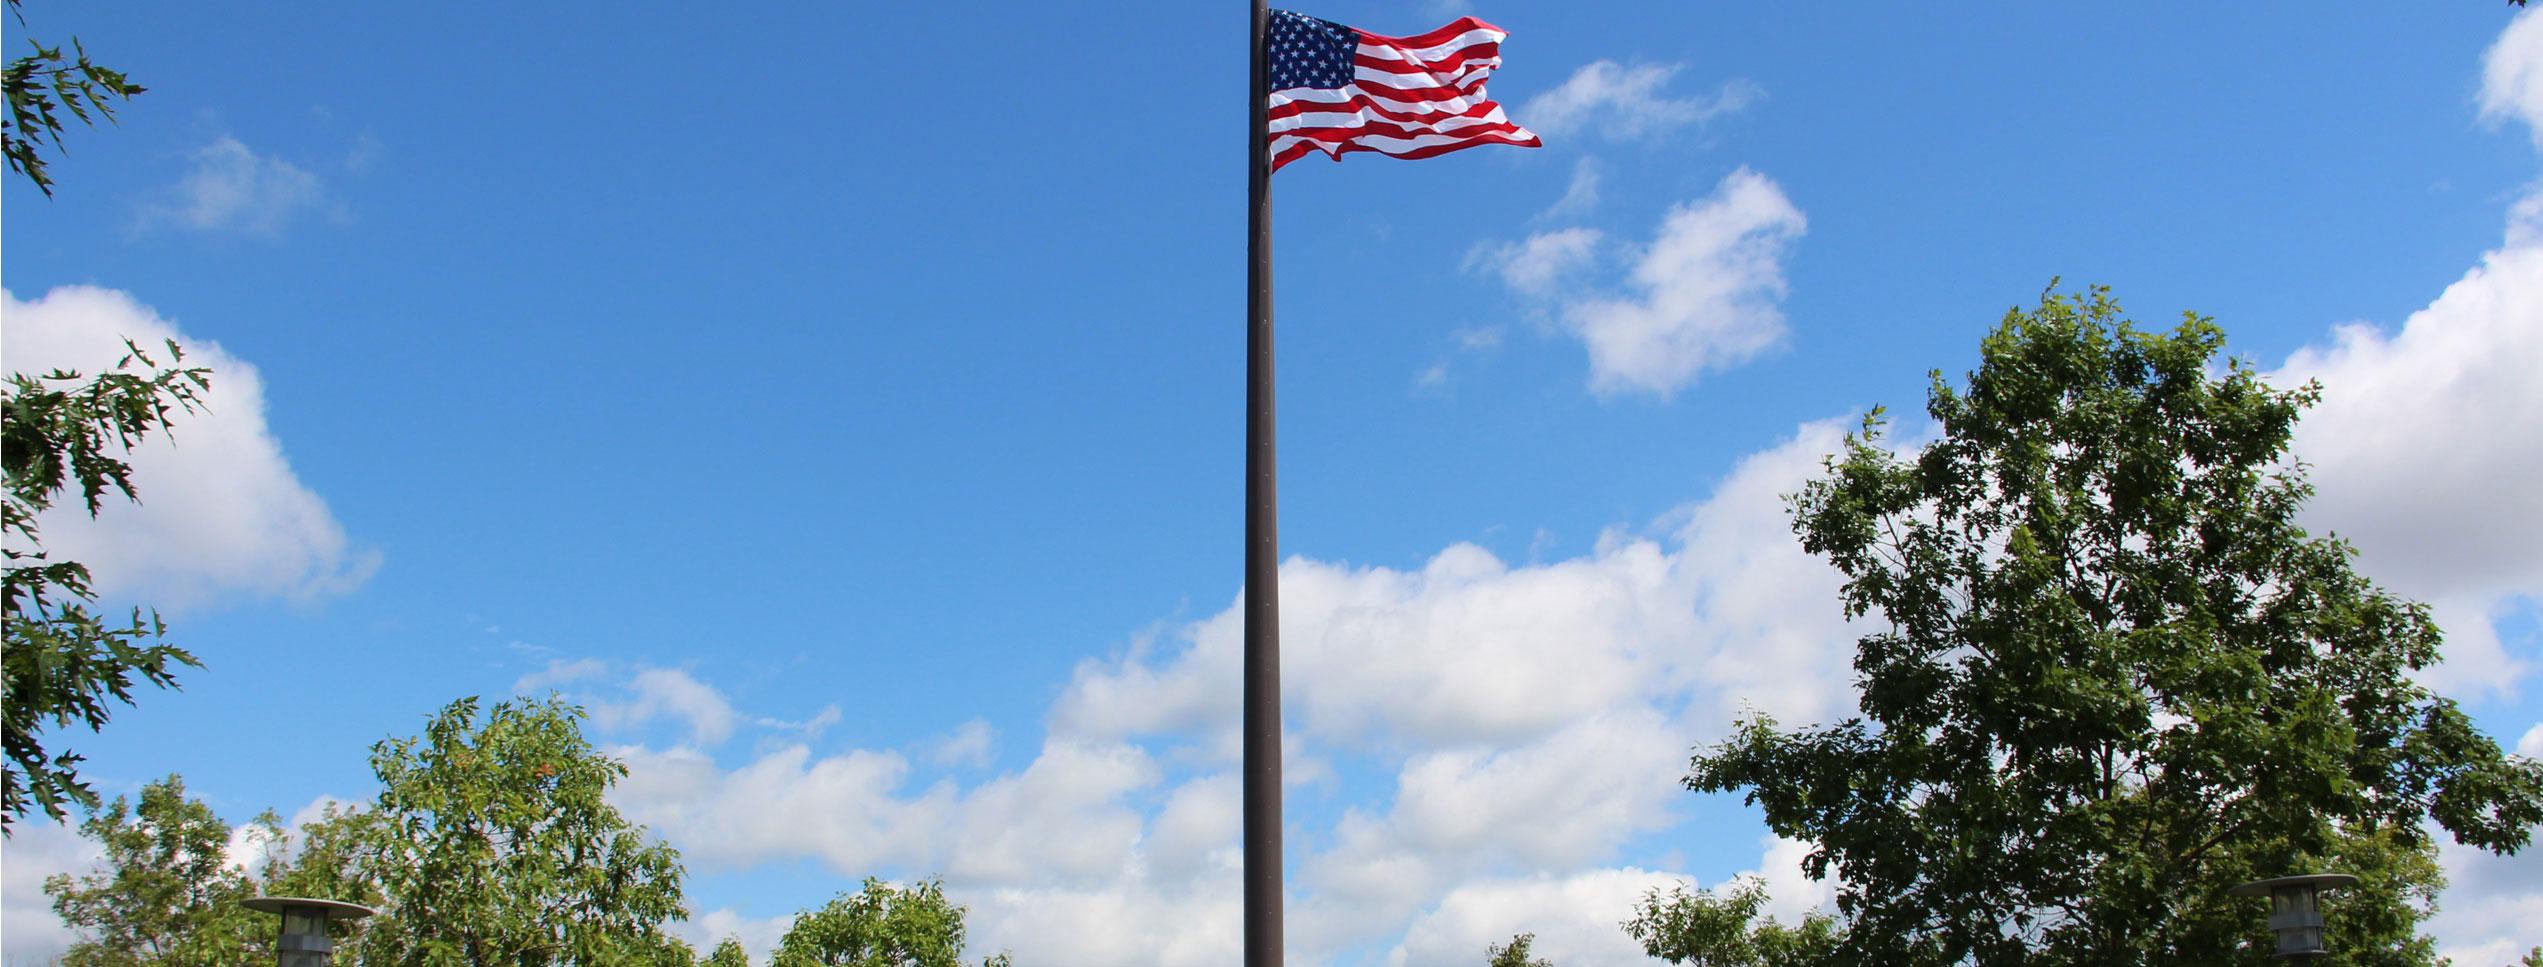 Acuity Insurance Flagpole | Mortenson